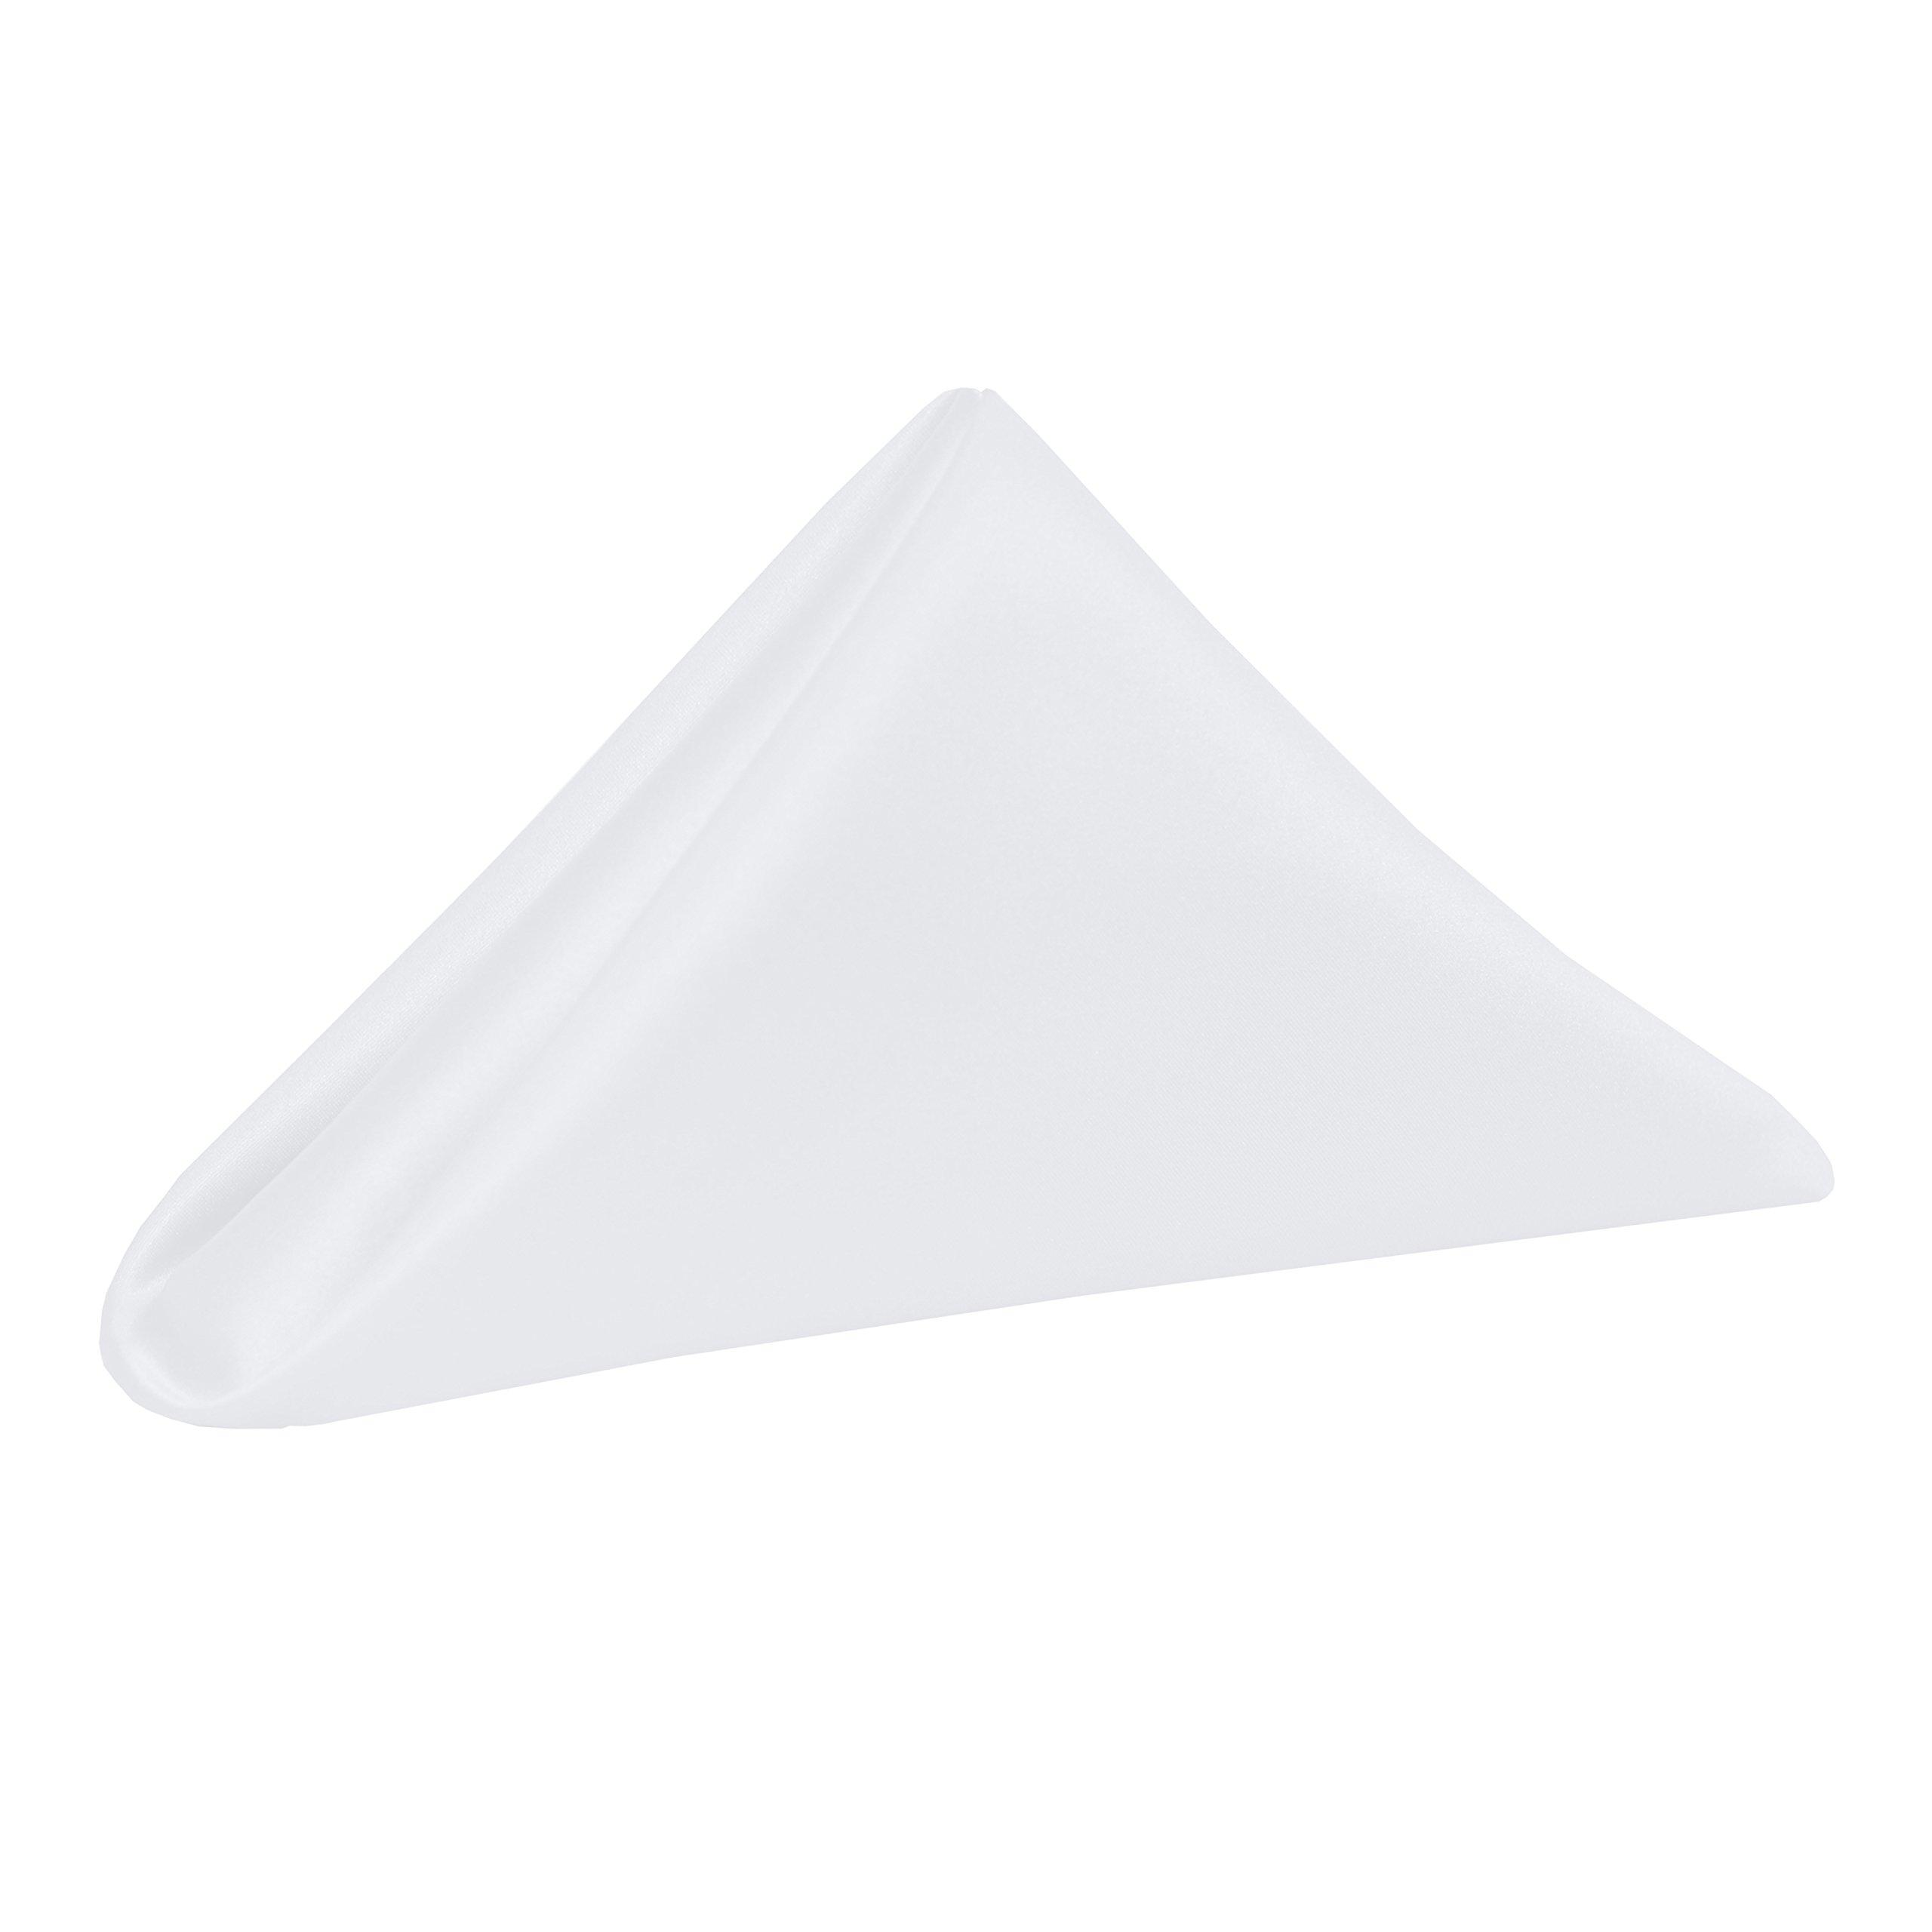 Ultimate Textile -5 Dozen- Bridal Satin 20 x 20-Inch Dinner Napkins, White